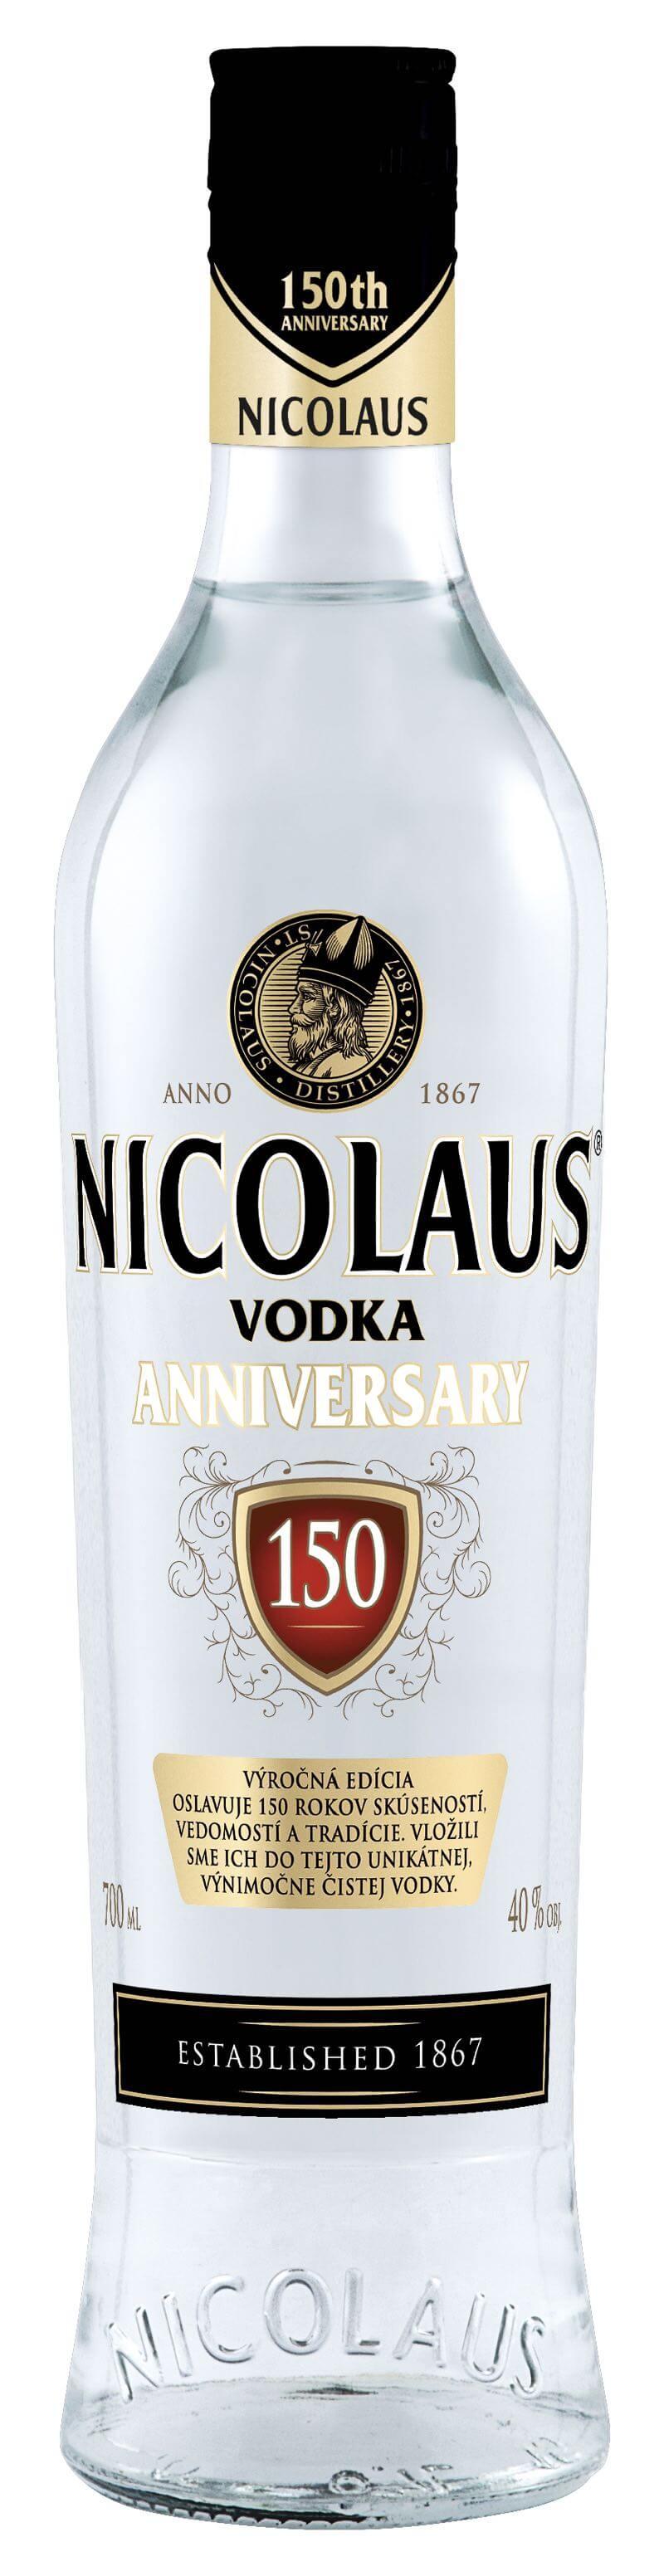 Nicolaus Anniversary Vodka 40% 0,7l